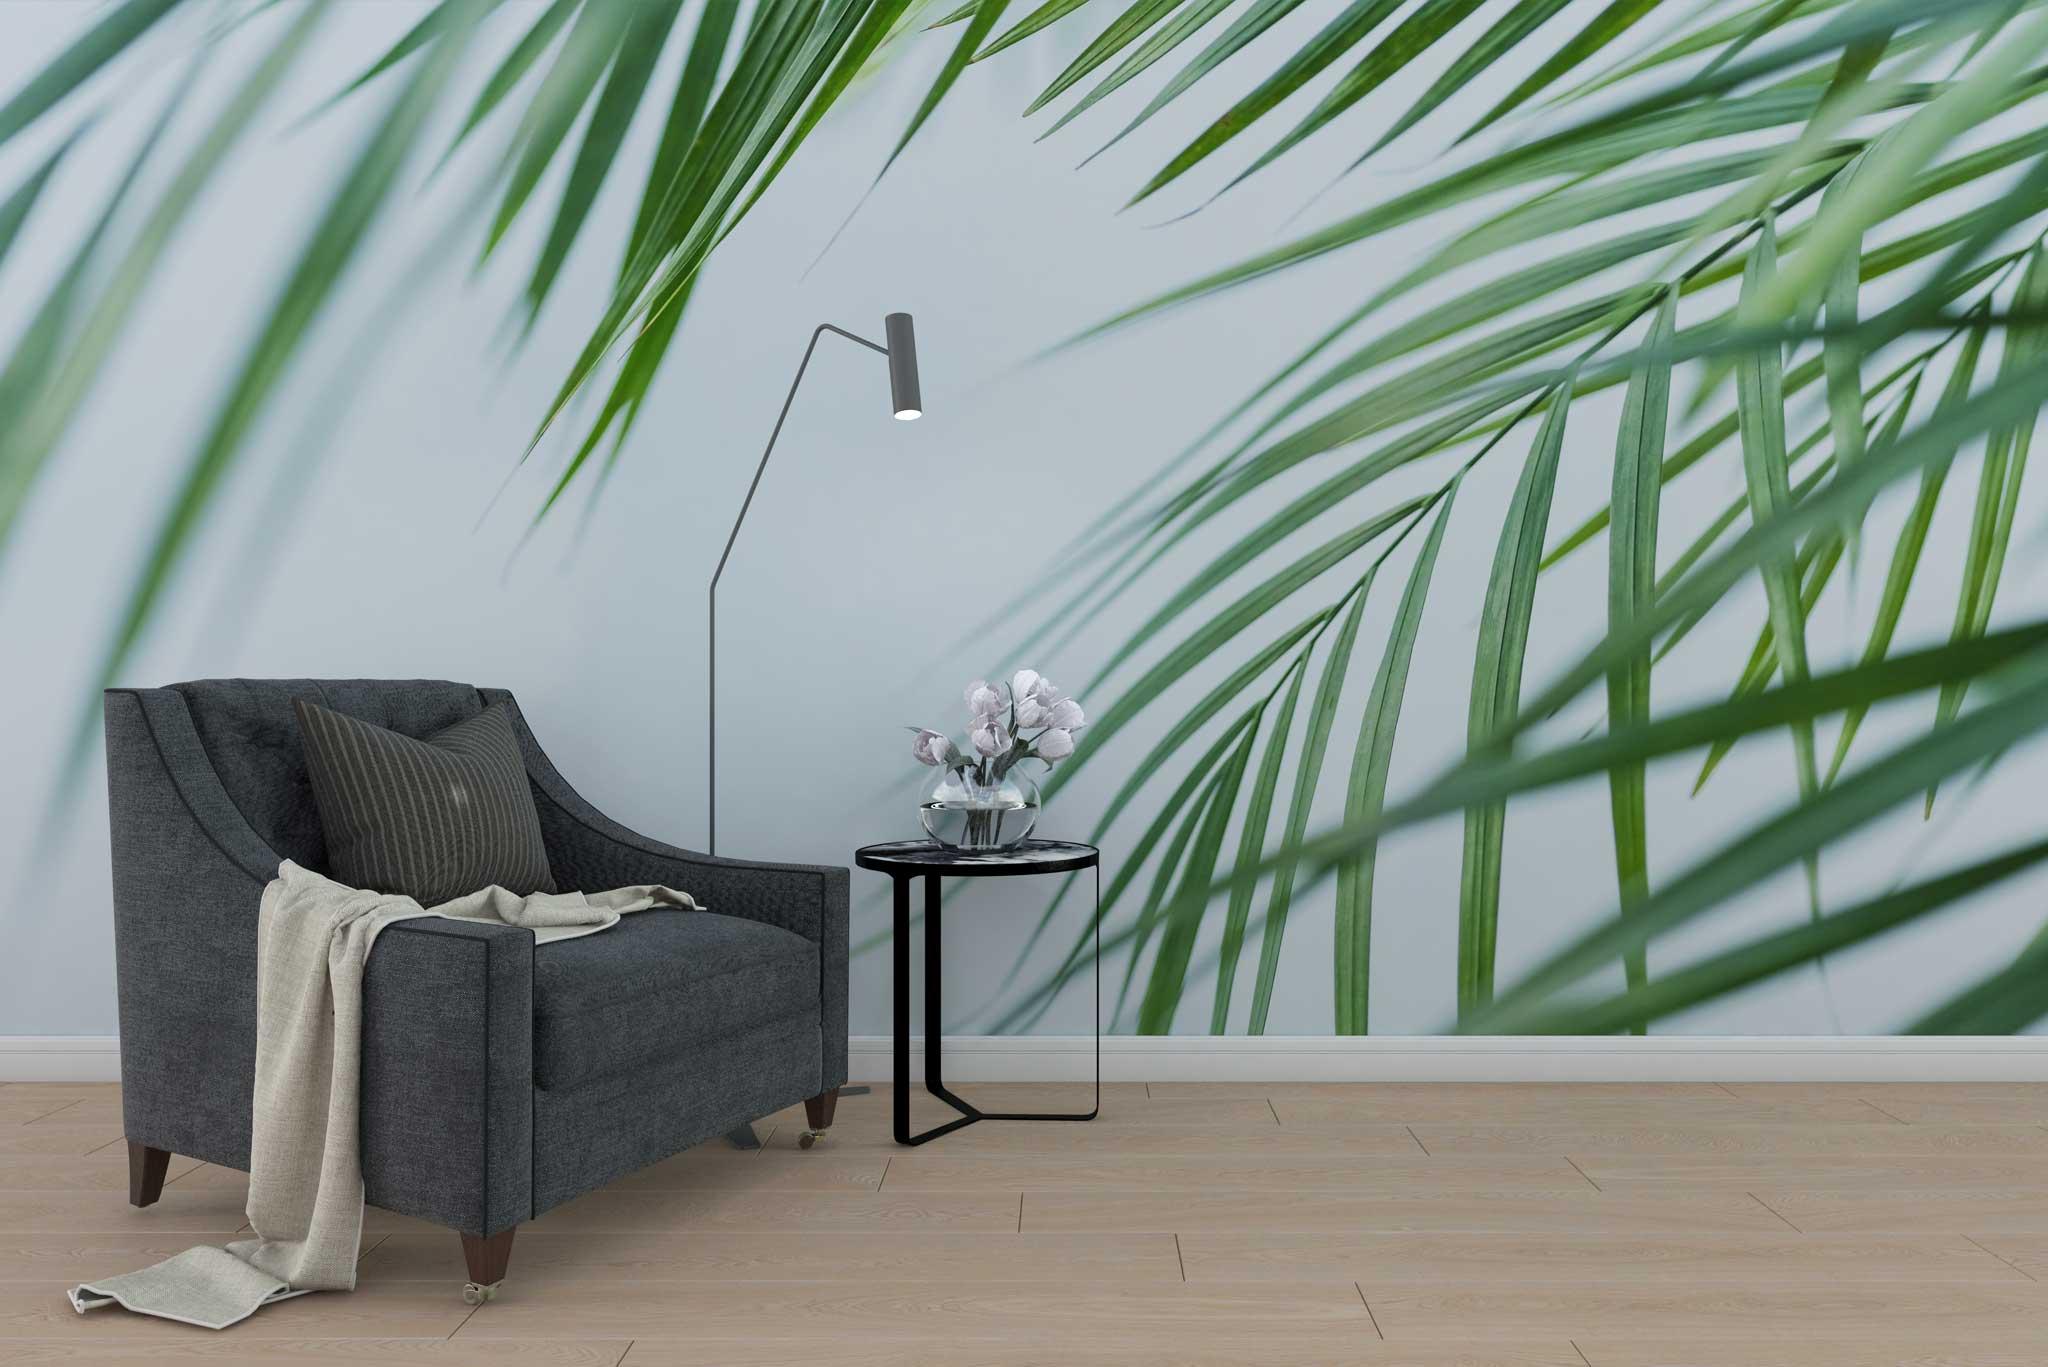 tapet-fototapet-special-personalizat-customizabil-comanda-bucuresti-daring-prints-model-imagine-macro-frunze-motiv-vegetal-frunze-verzi